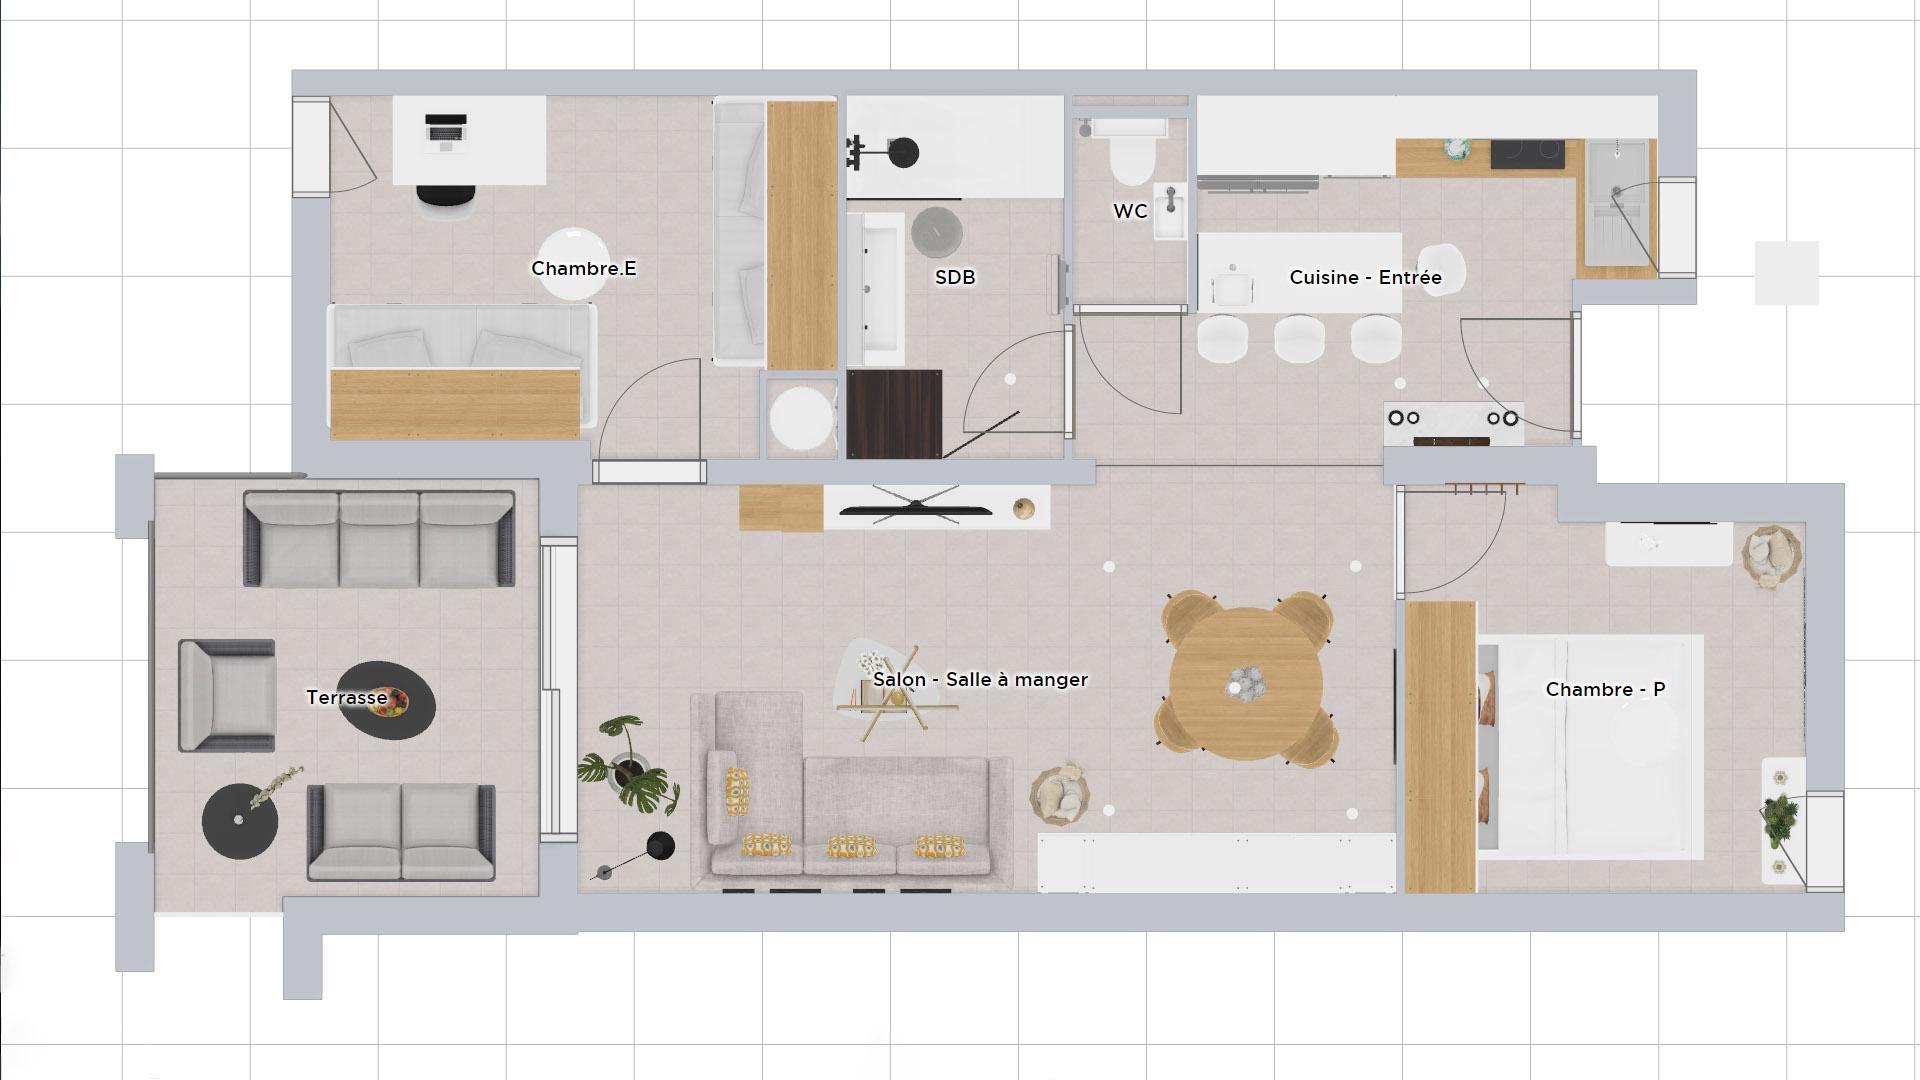 Plan 2D réaménagement